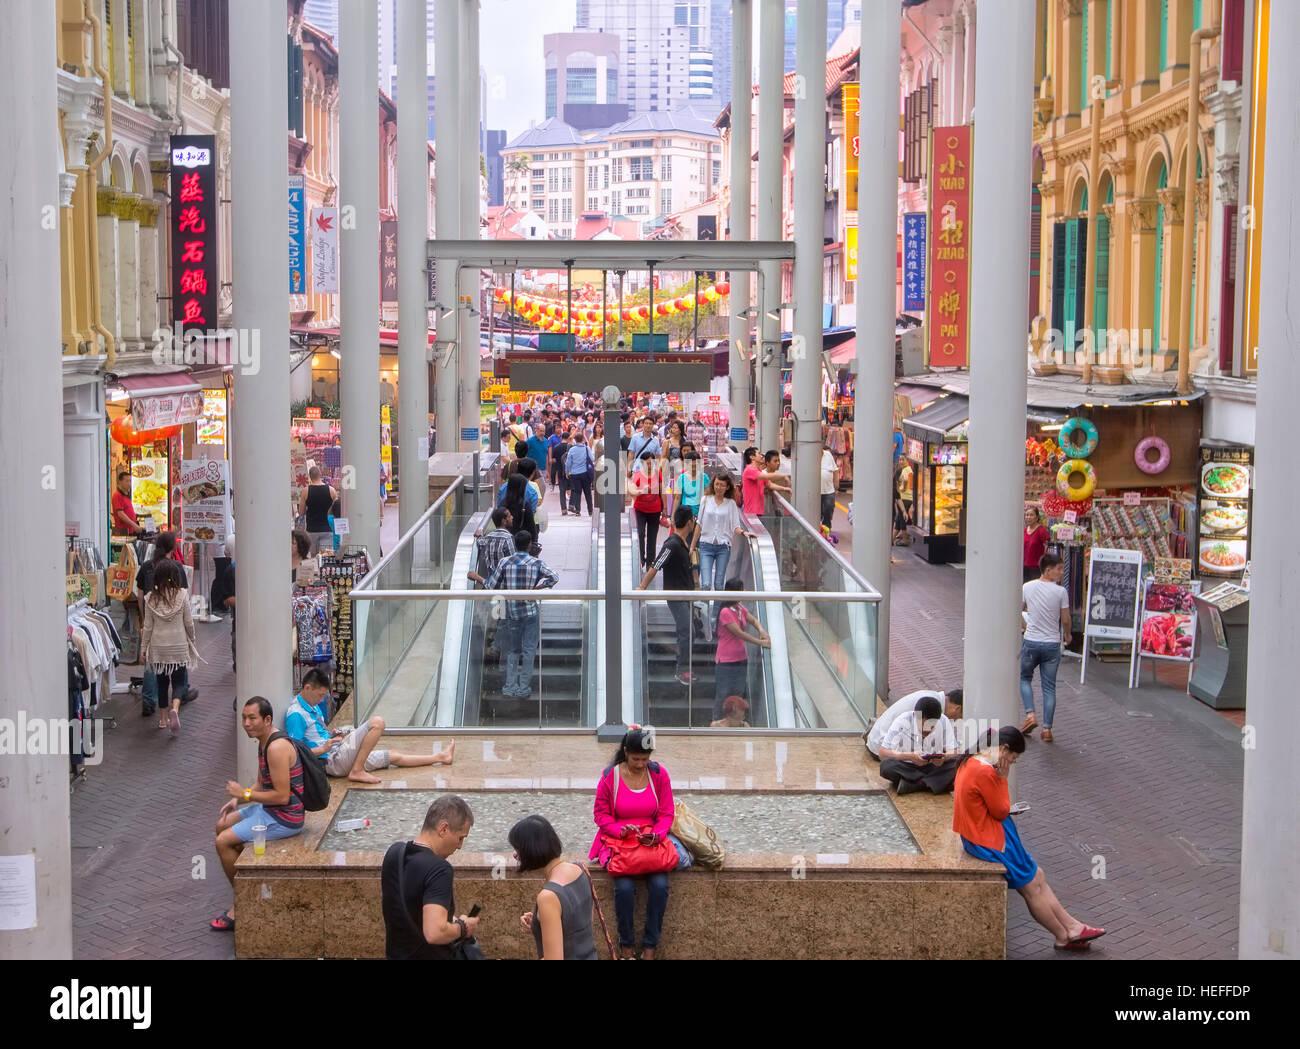 Subway station in Chinatown, Singapore - Stock Image